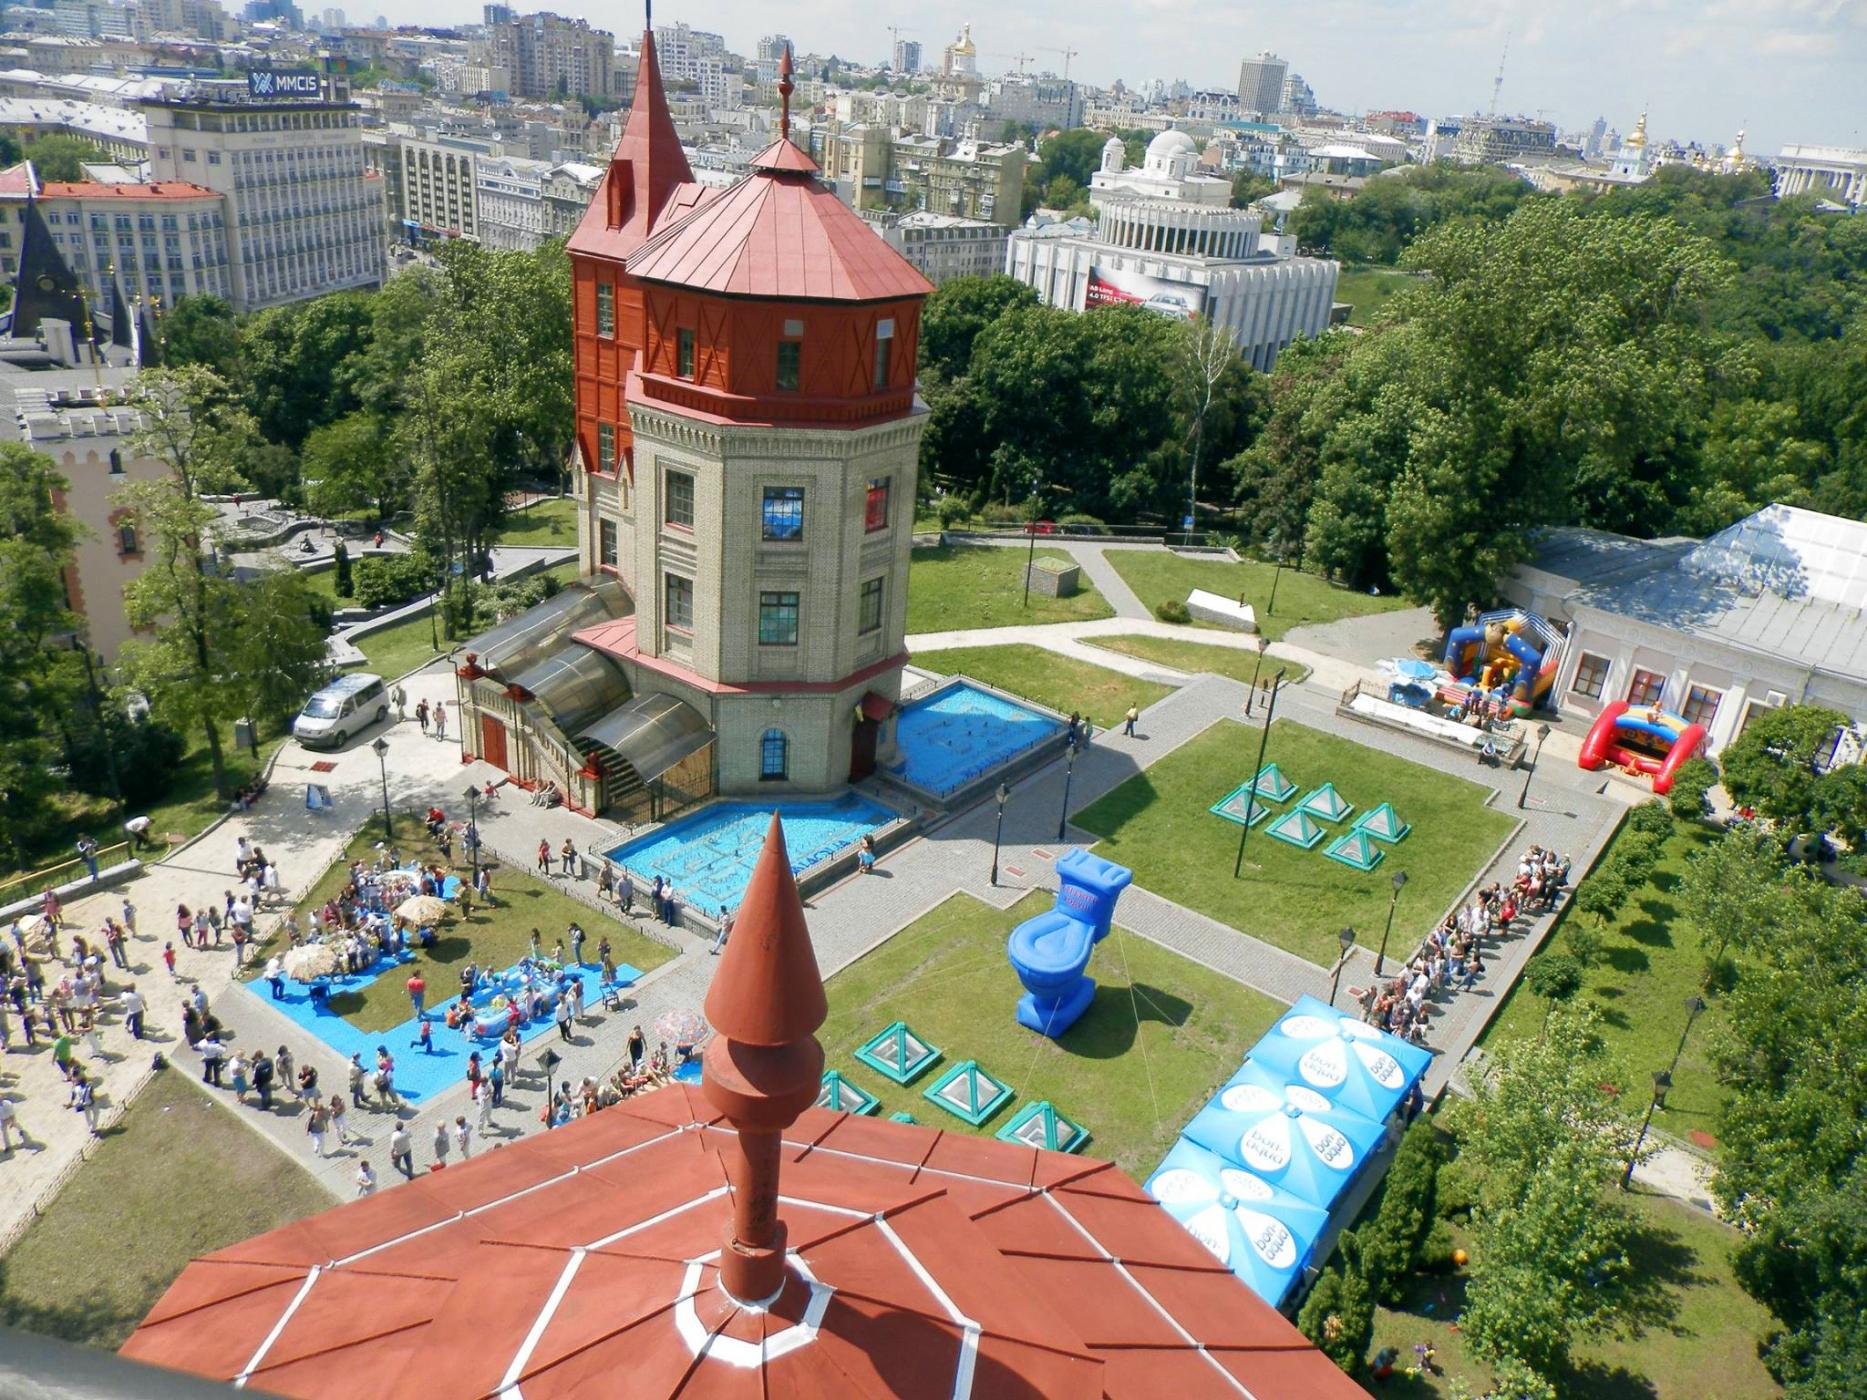 Окраска потолков из гипсокартона контраст картинки дворец